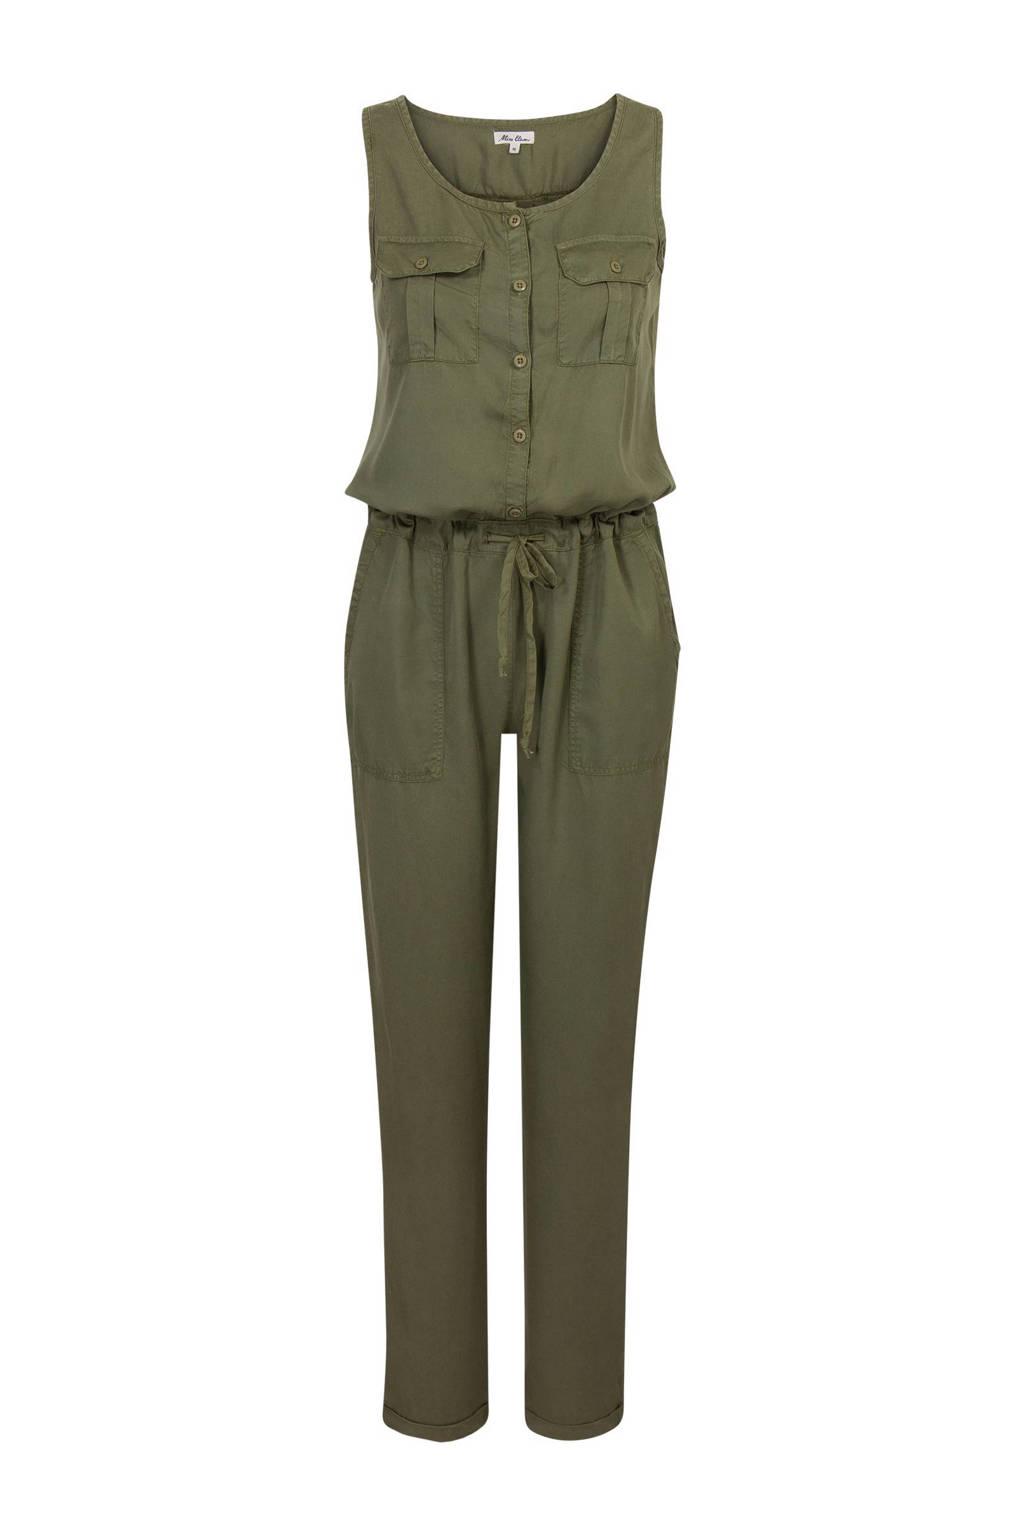 Miss Etam Regulier jumpsuit, leger groen